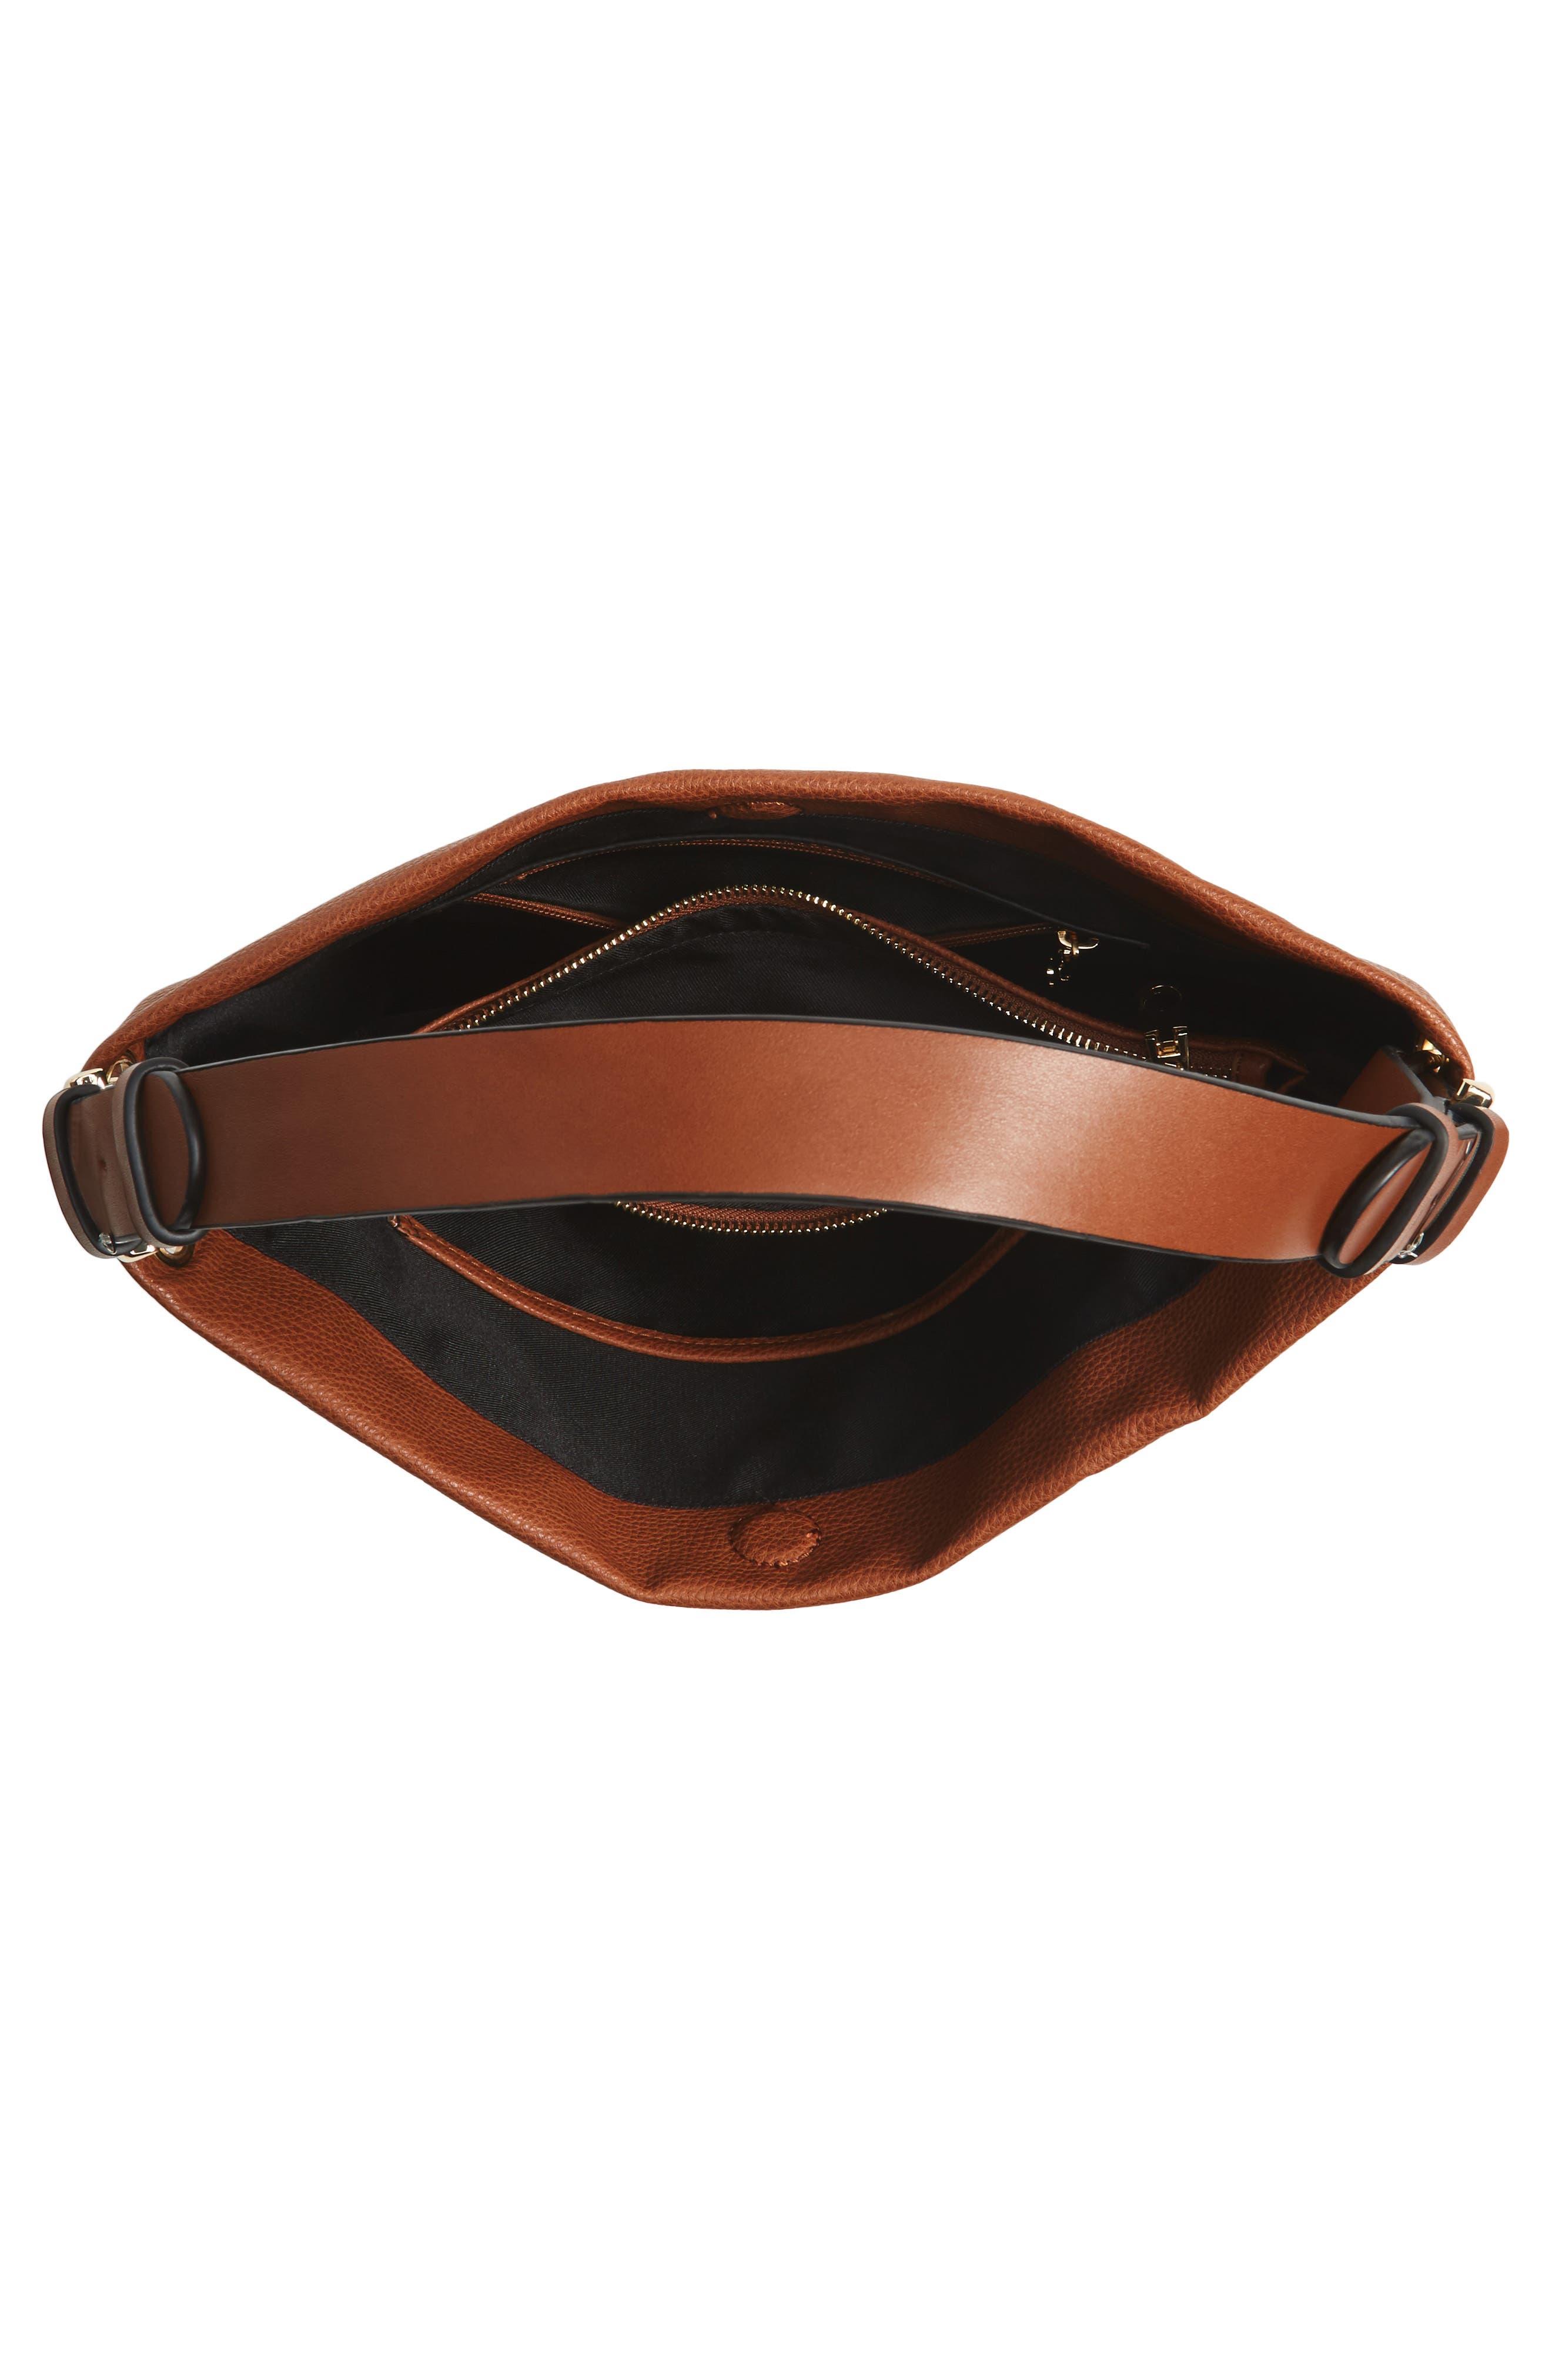 Taylor Faux Leather Shoulder Bag,                             Alternate thumbnail 12, color,